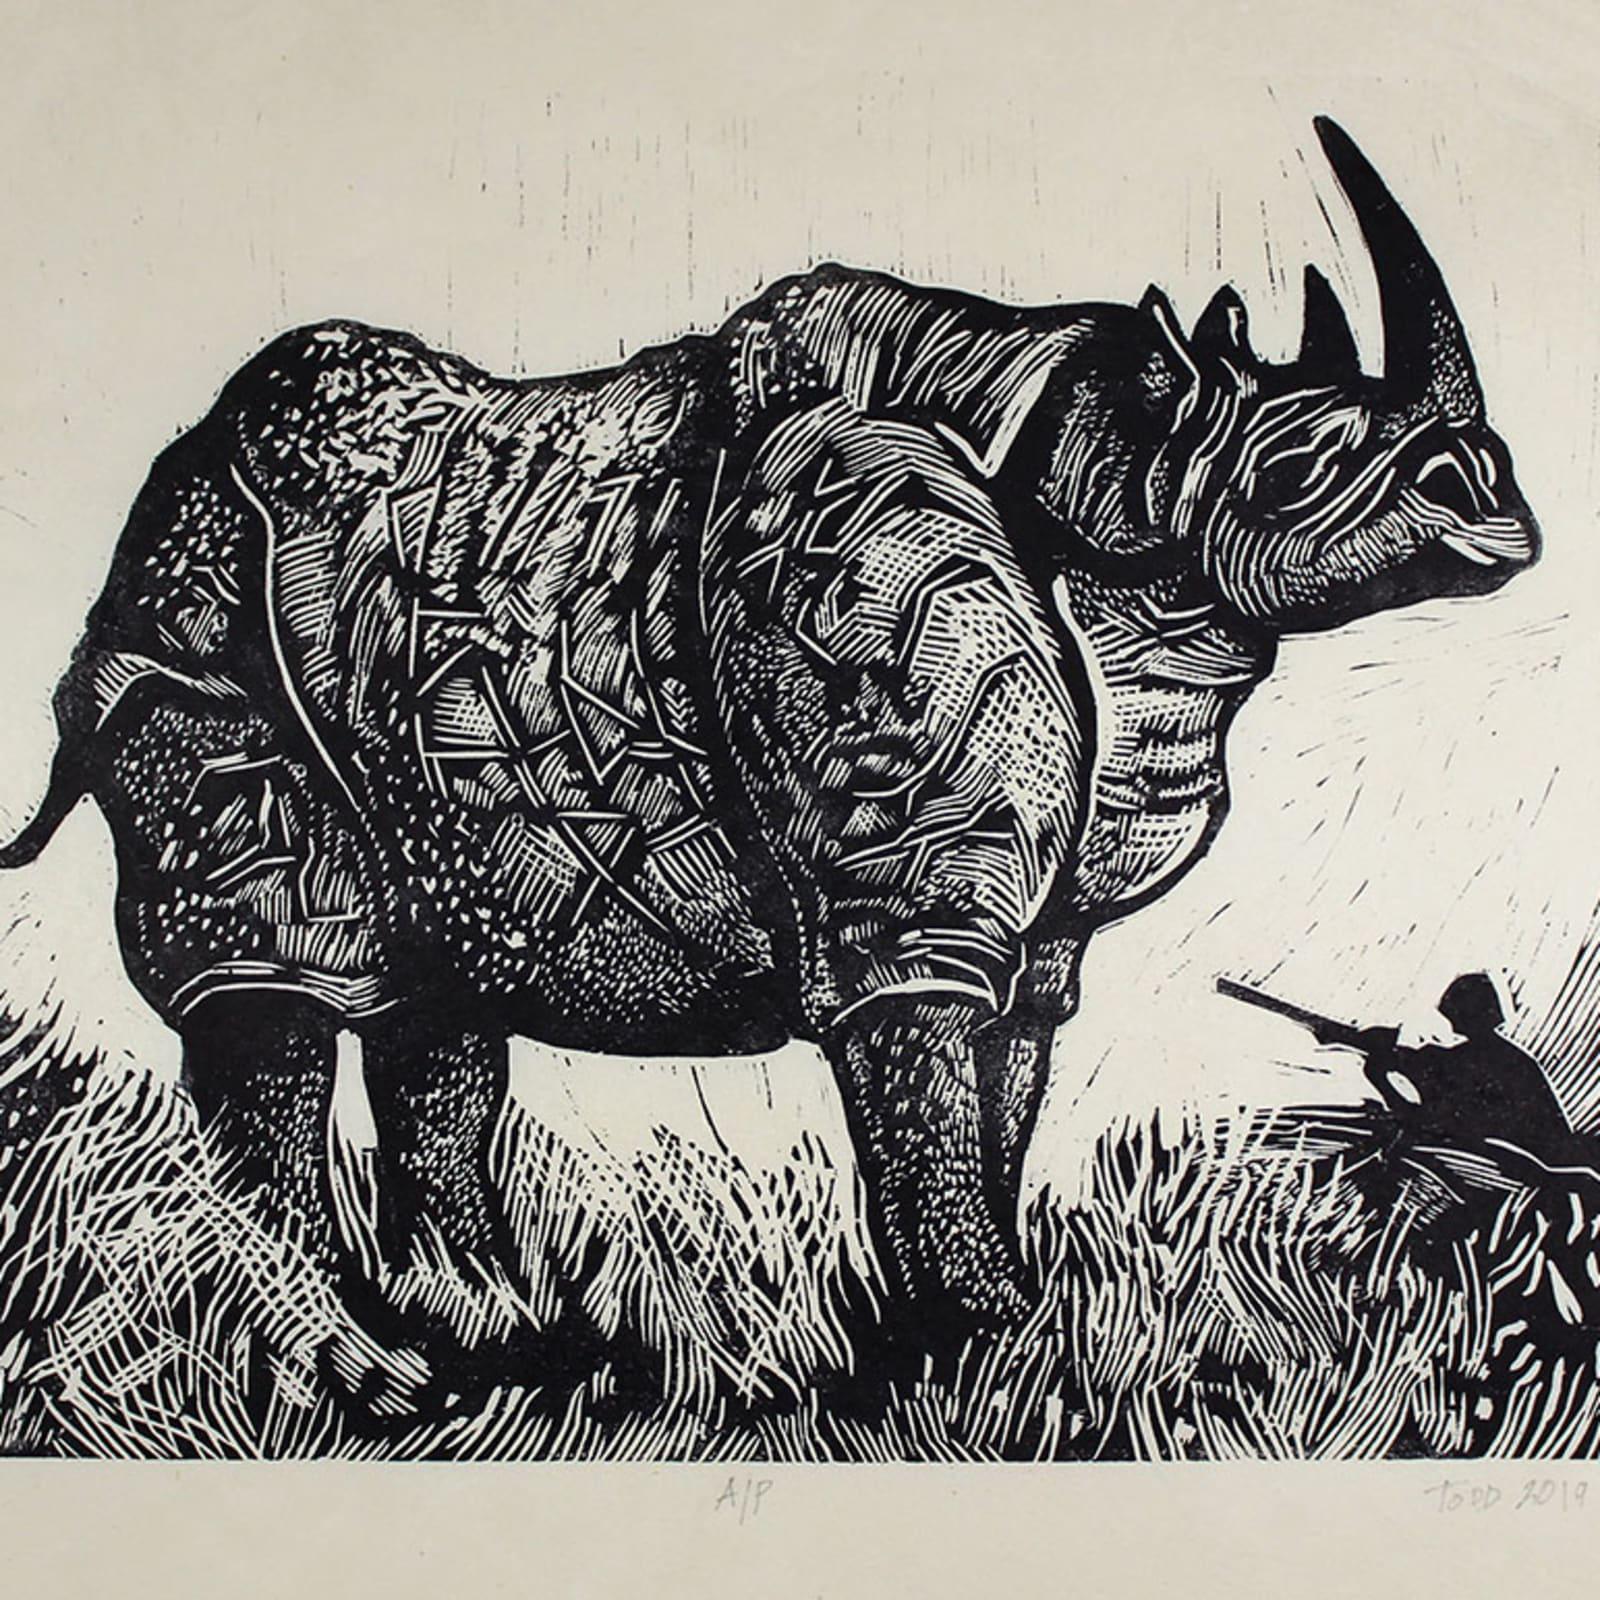 James G. Todd, Rhino, 2019